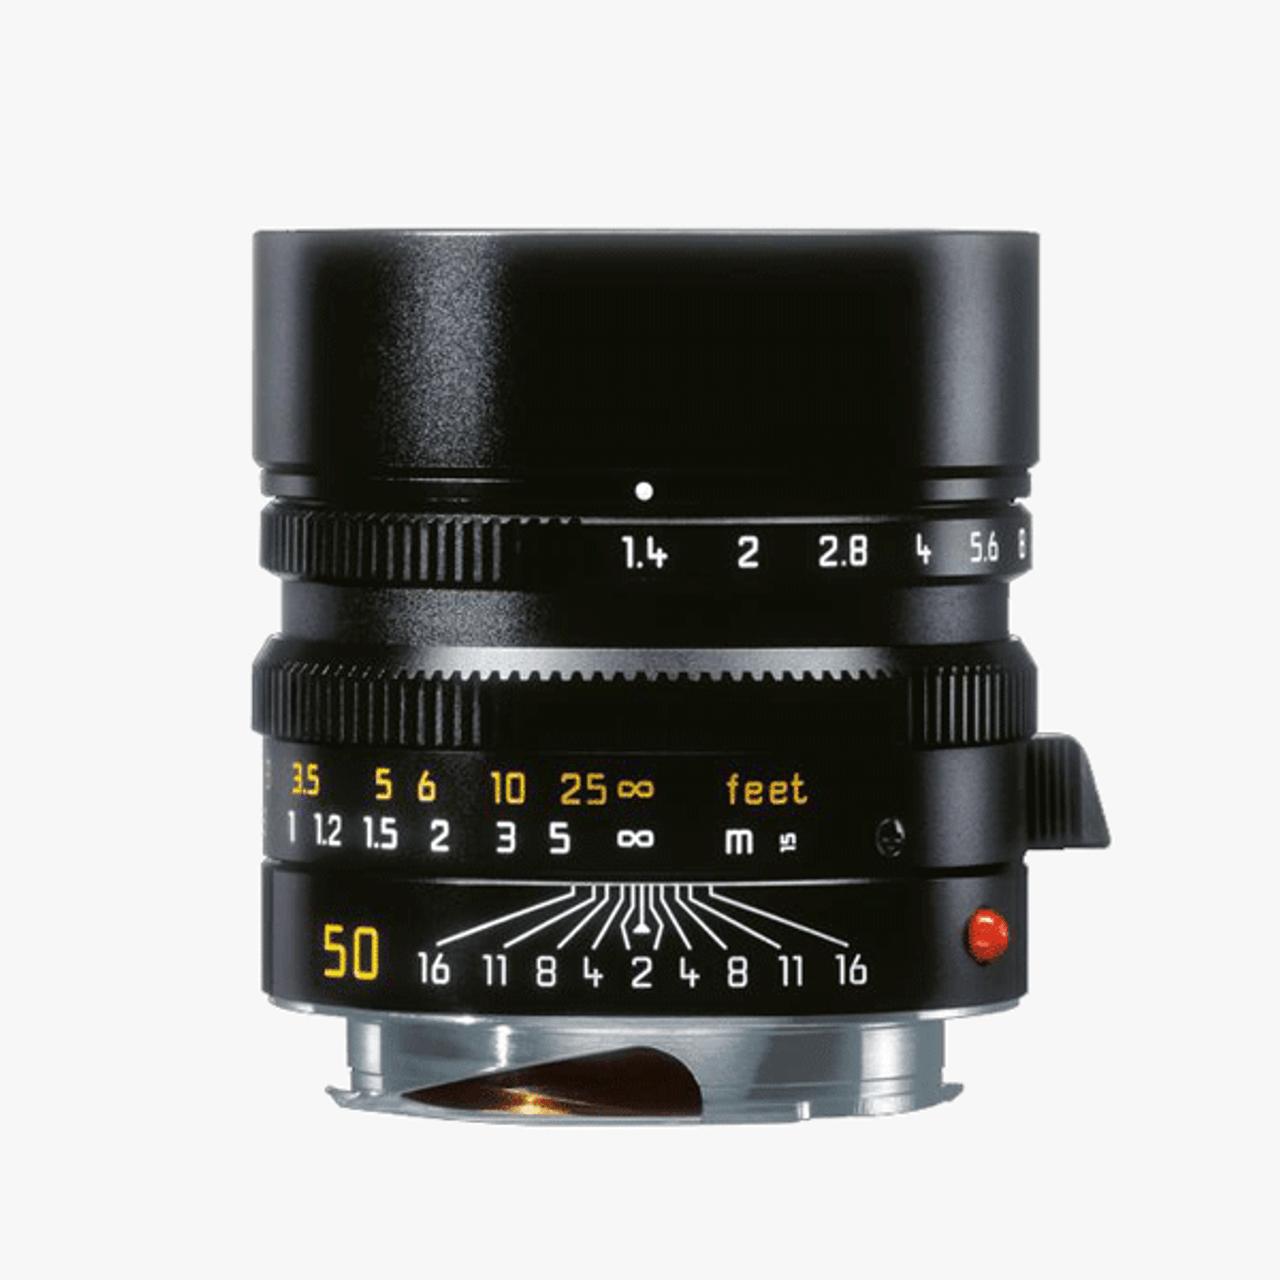 Leica Summilux-M 50mm F1.4 ASPH Black (11891)